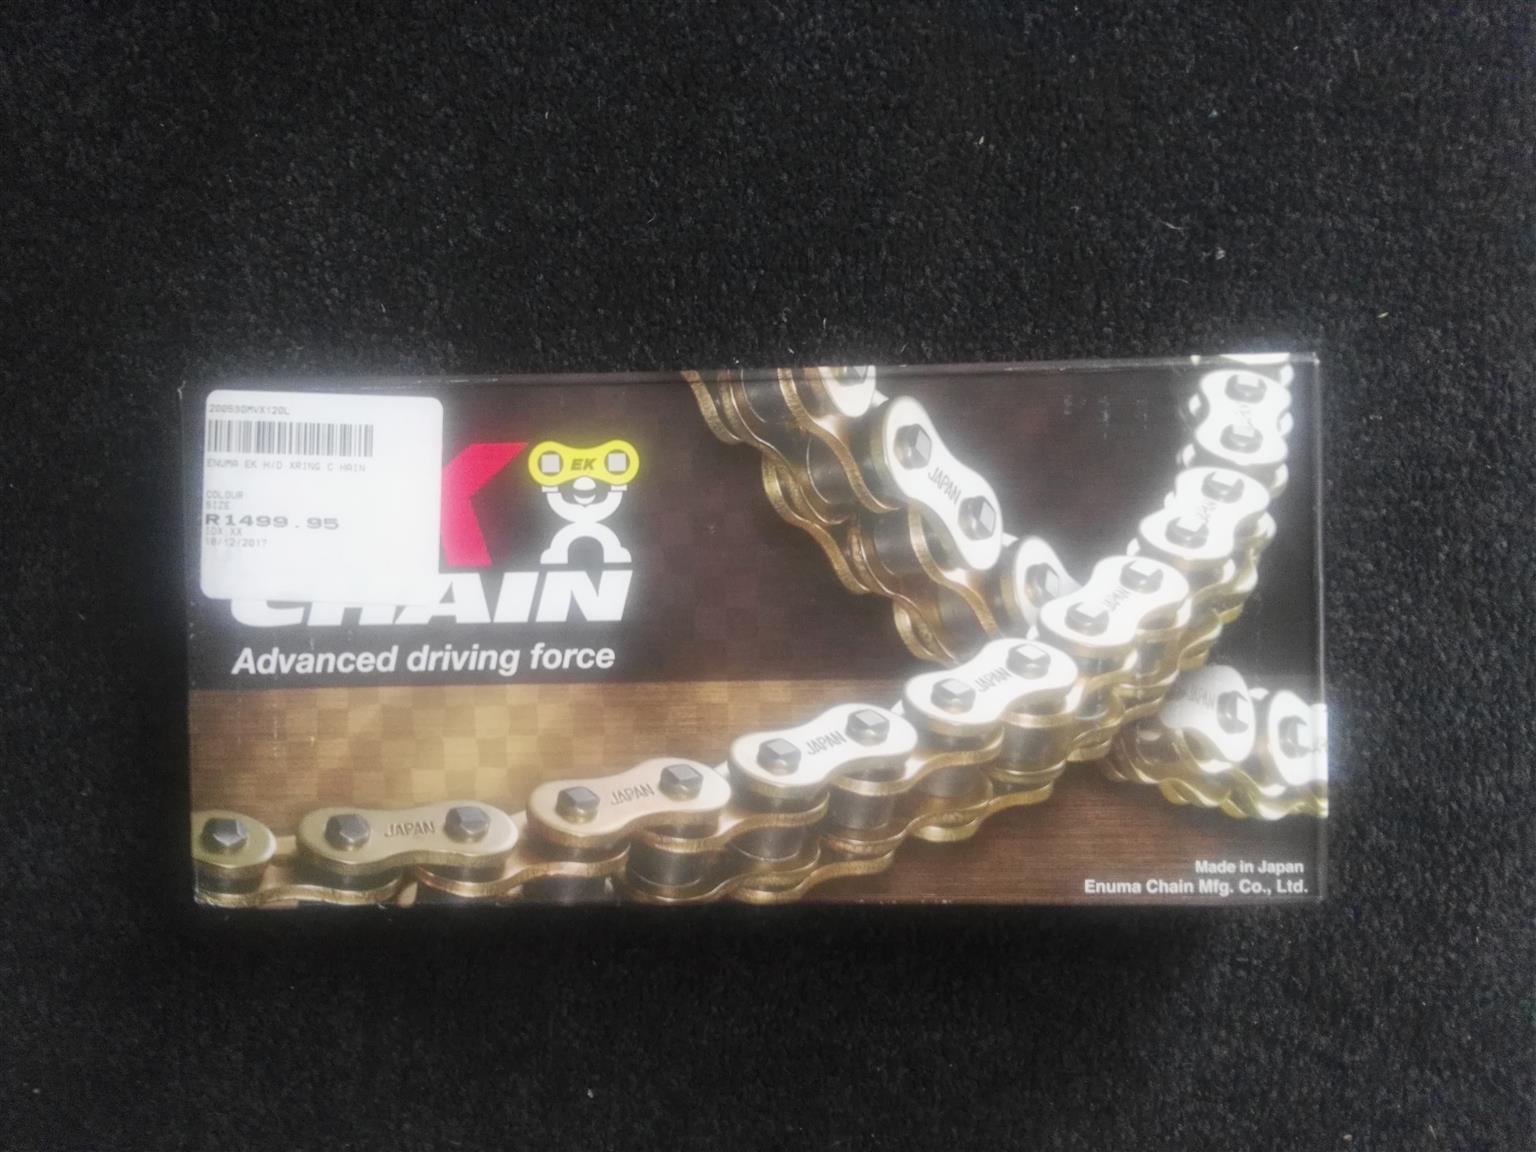 X-Ring chain 530 brand new